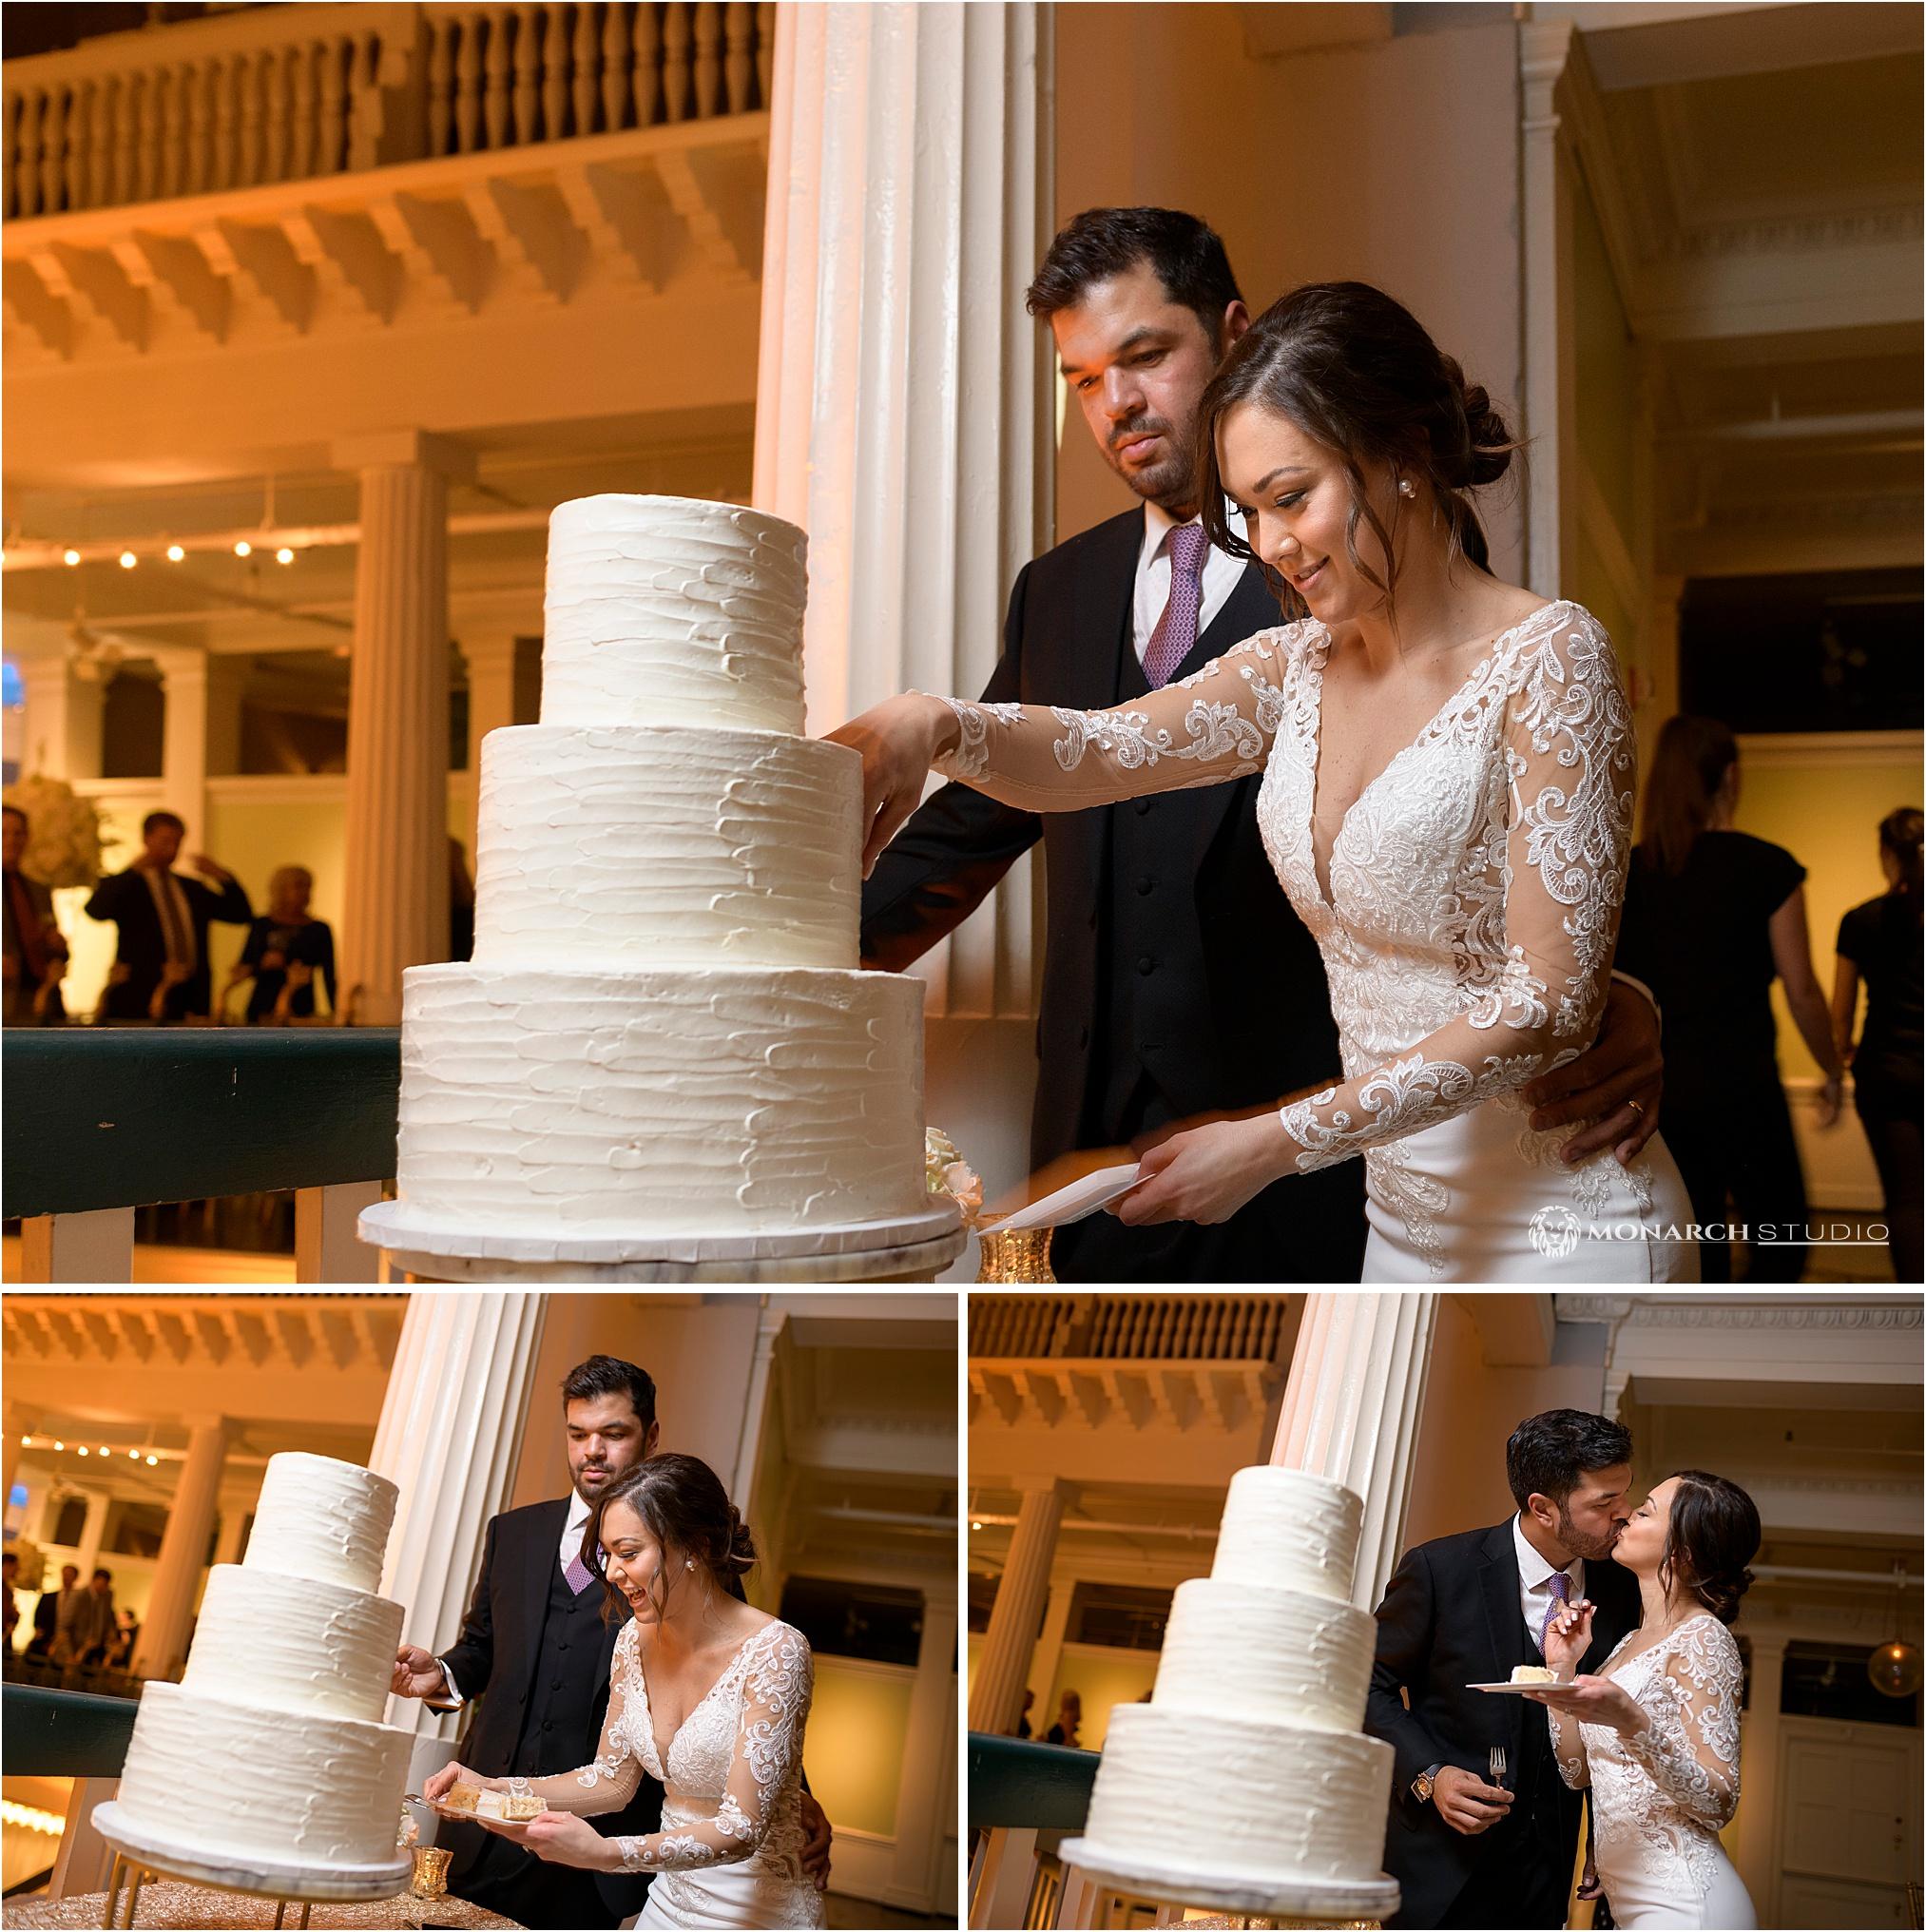 st-augustine-high-end-wedding-photographers-129.jpg